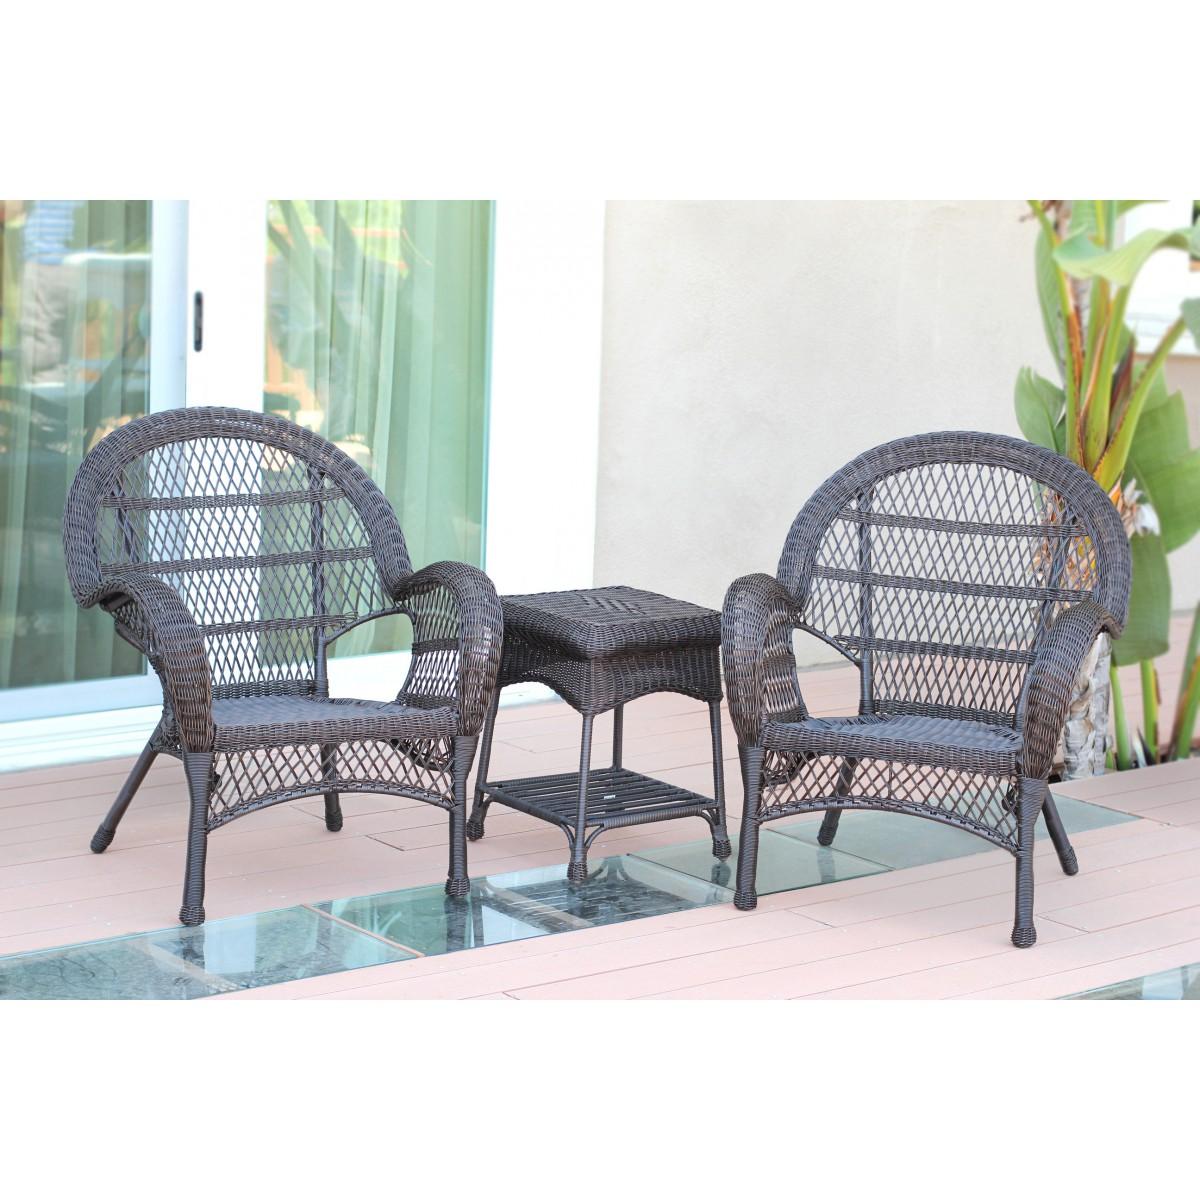 3pc Santa Maria Espresso Wicker Chair Set Without Cushion